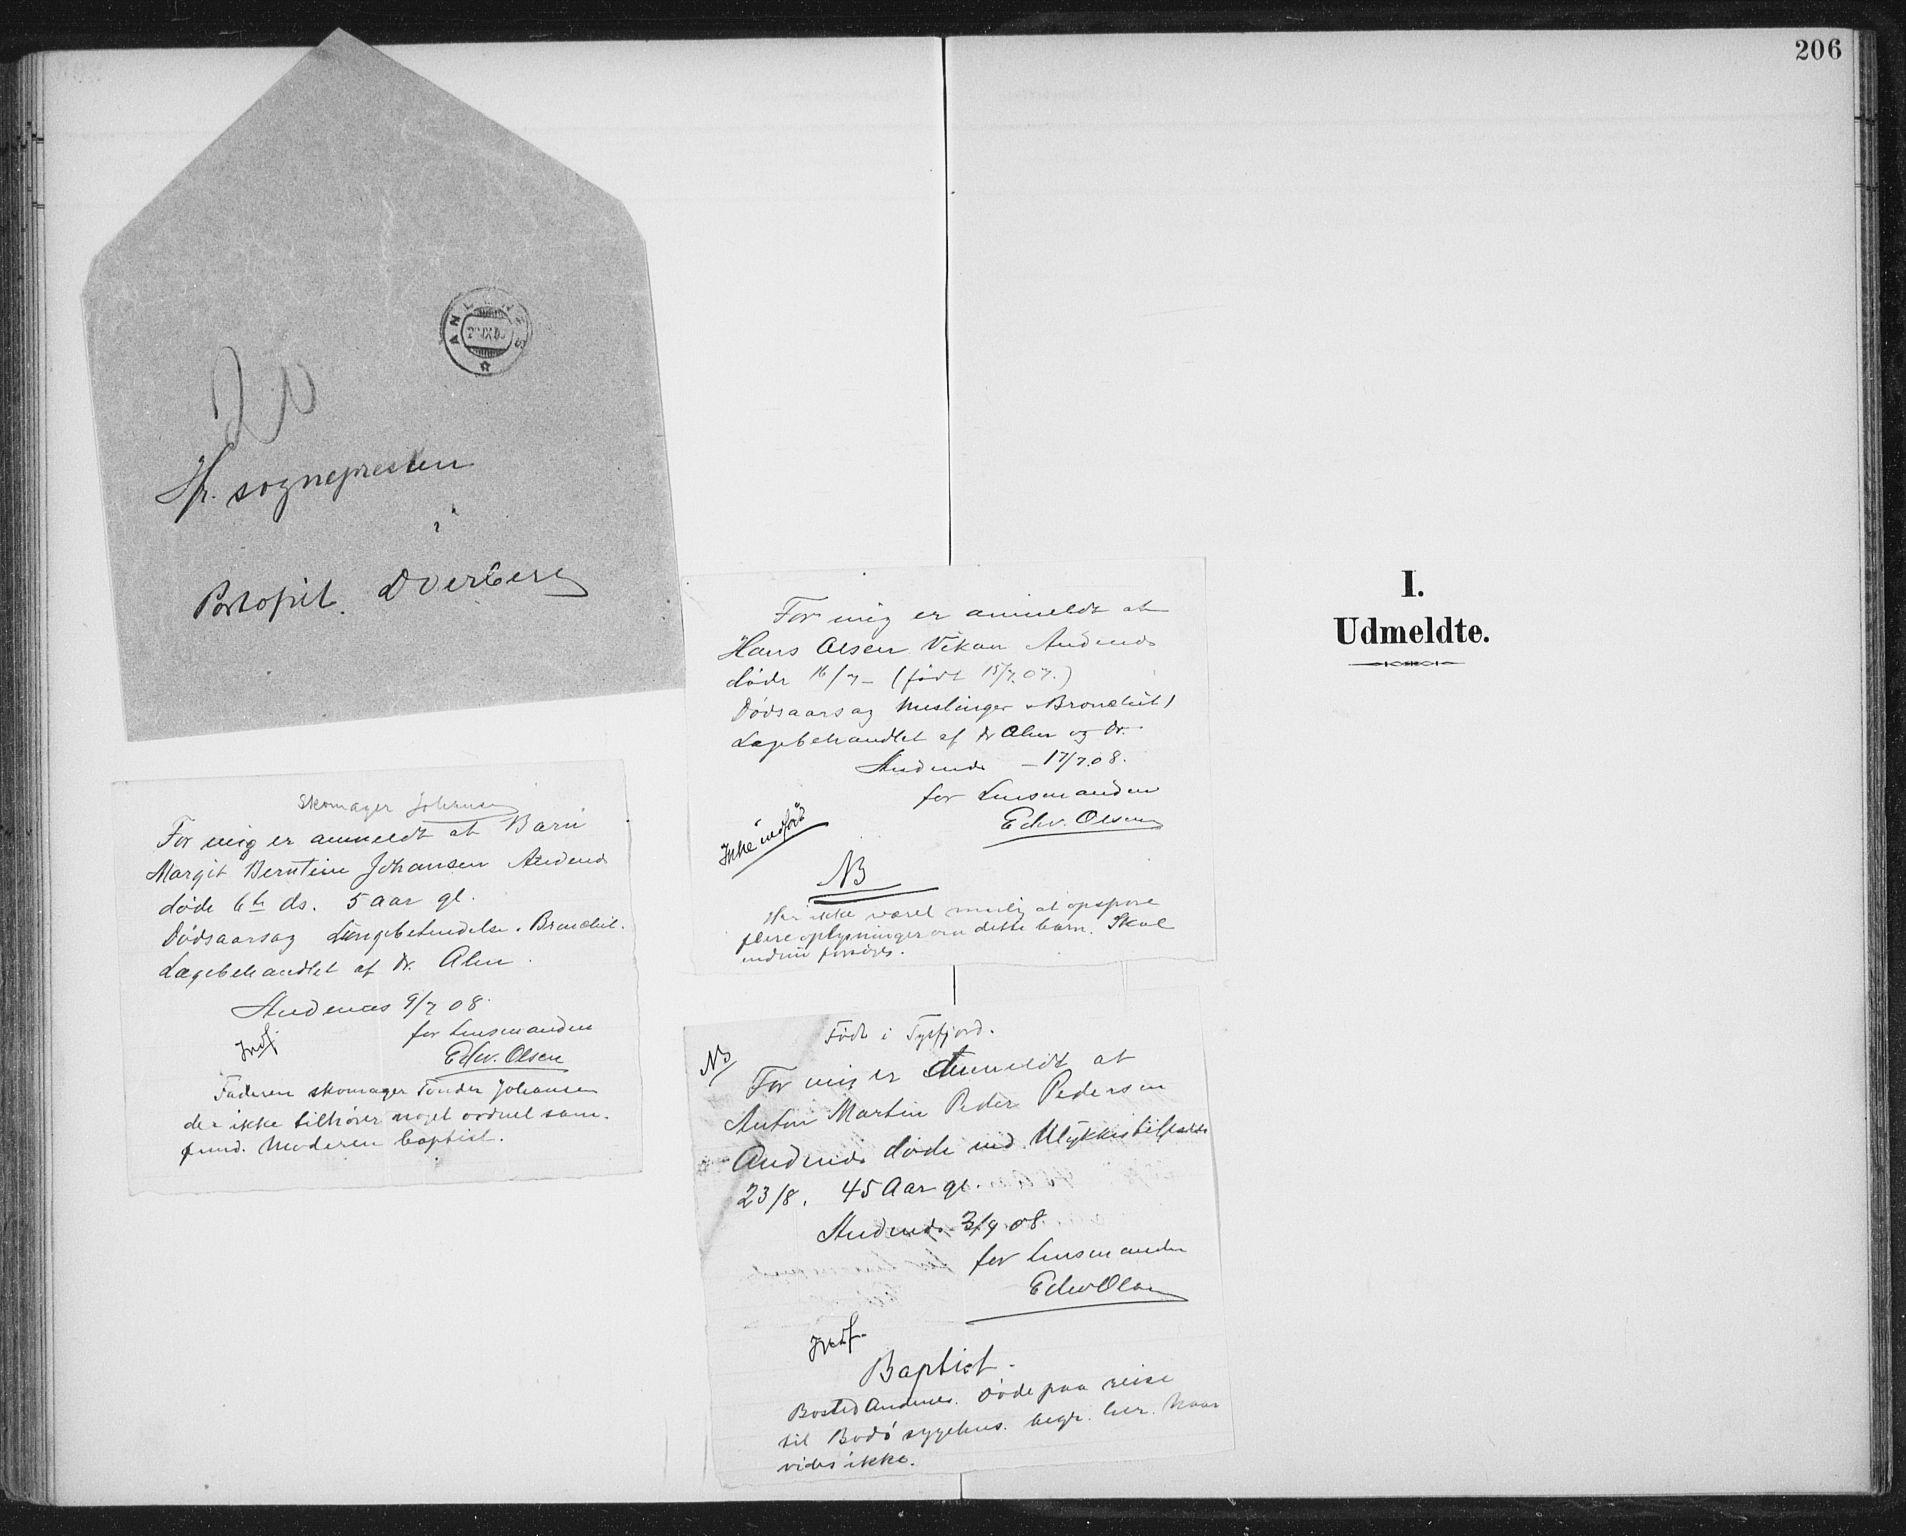 SAT, Ministerialprotokoller, klokkerbøker og fødselsregistre - Nordland, 899/L1437: Ministerialbok nr. 899A05, 1897-1908, s. 206